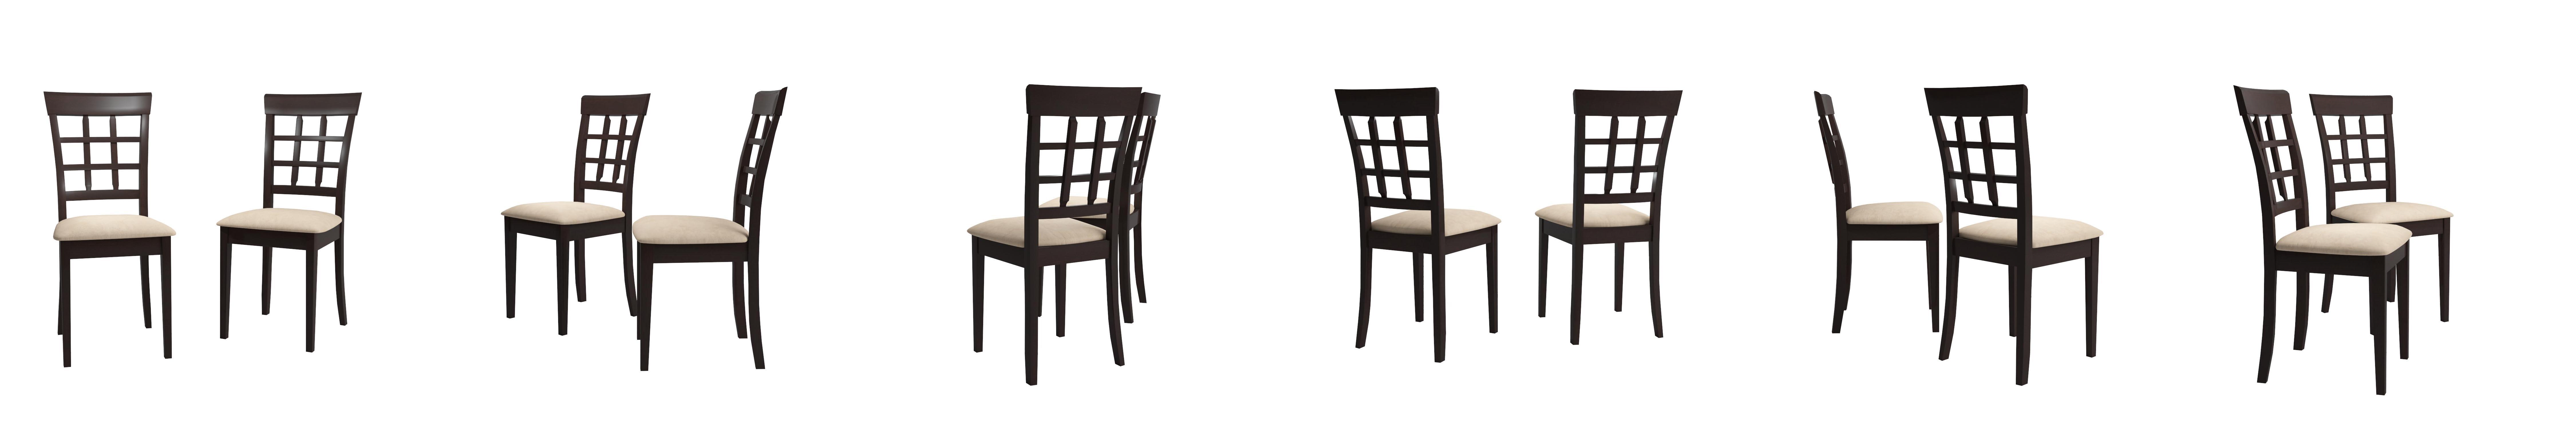 Amazon.com: Coaster Home Furnishings Gabriel Modern Window Back Side Chair  ( Set Of 2 )   Cappuccino / Tan Microfiber: Kitchen U0026 Dining